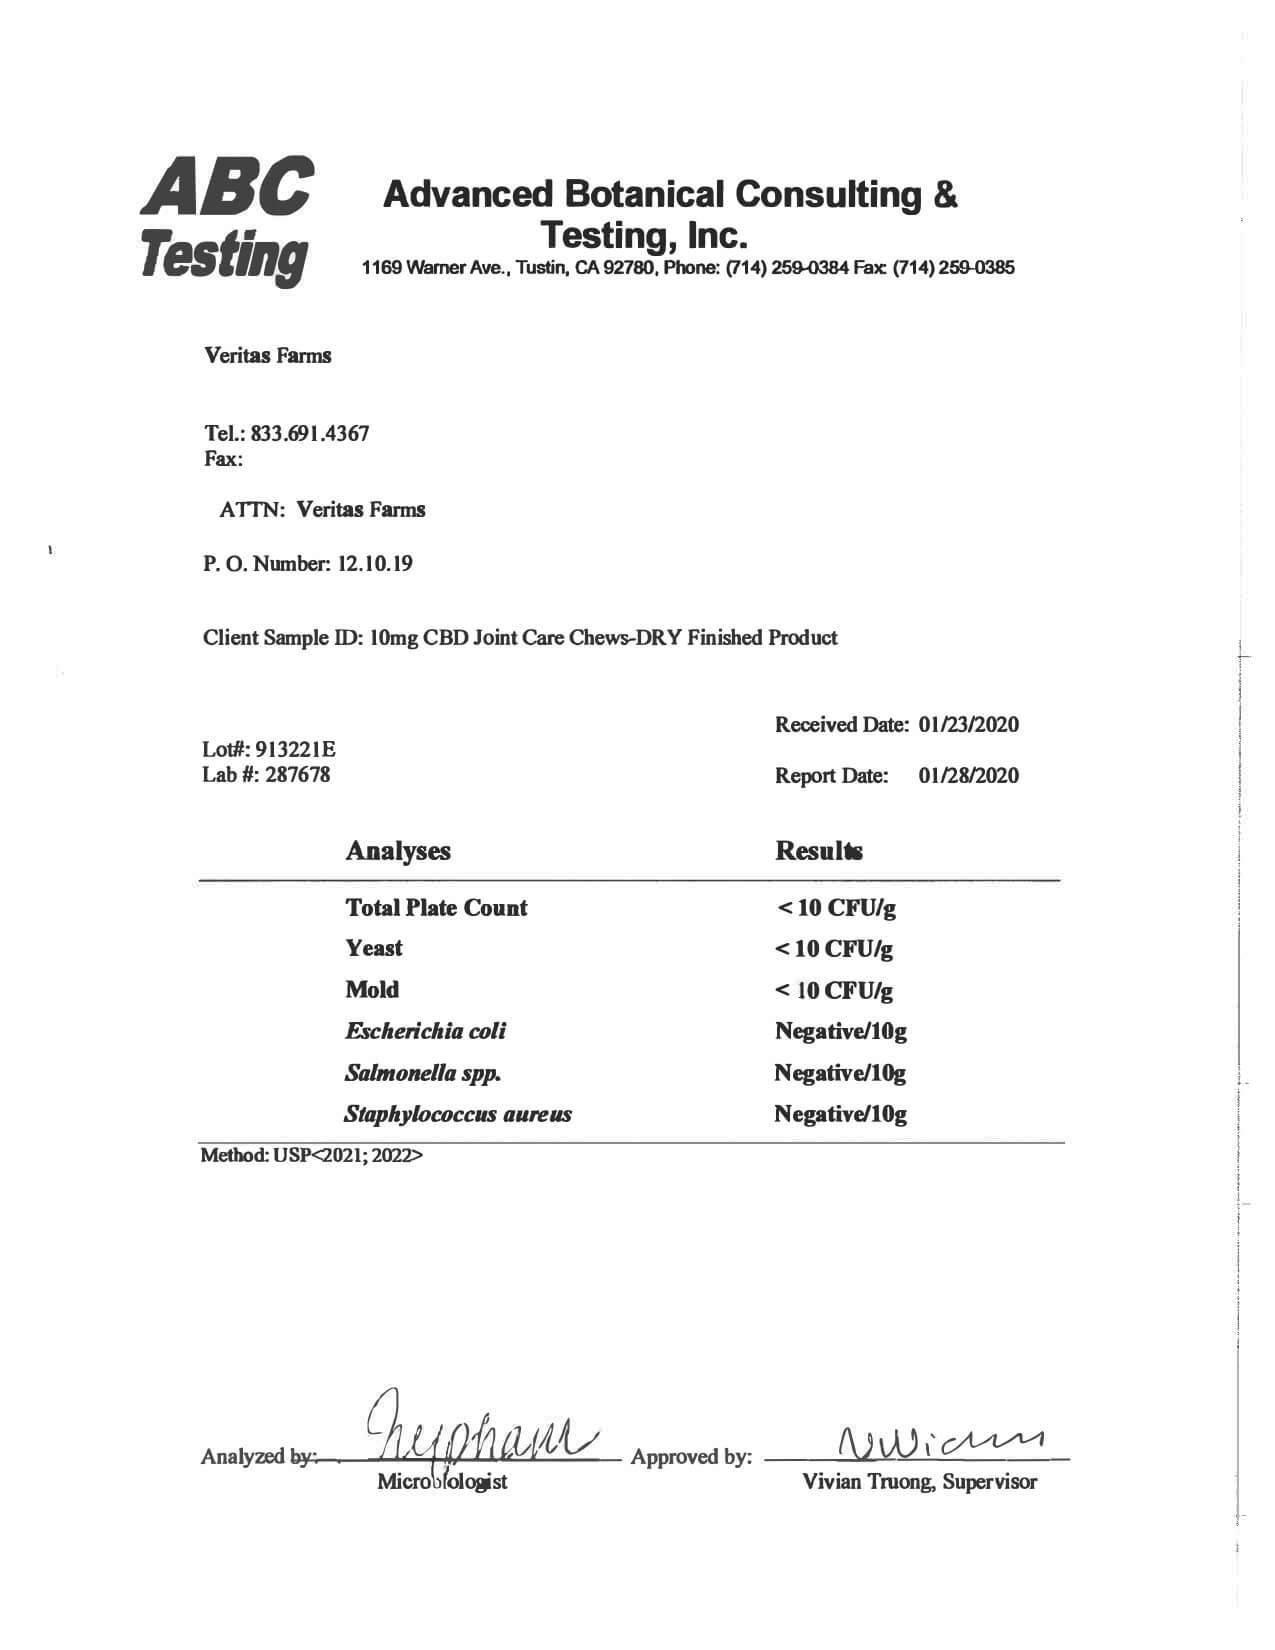 Veritas Farms CBD Pet Edible Full Spectrum Joint Care Chews Lab Report